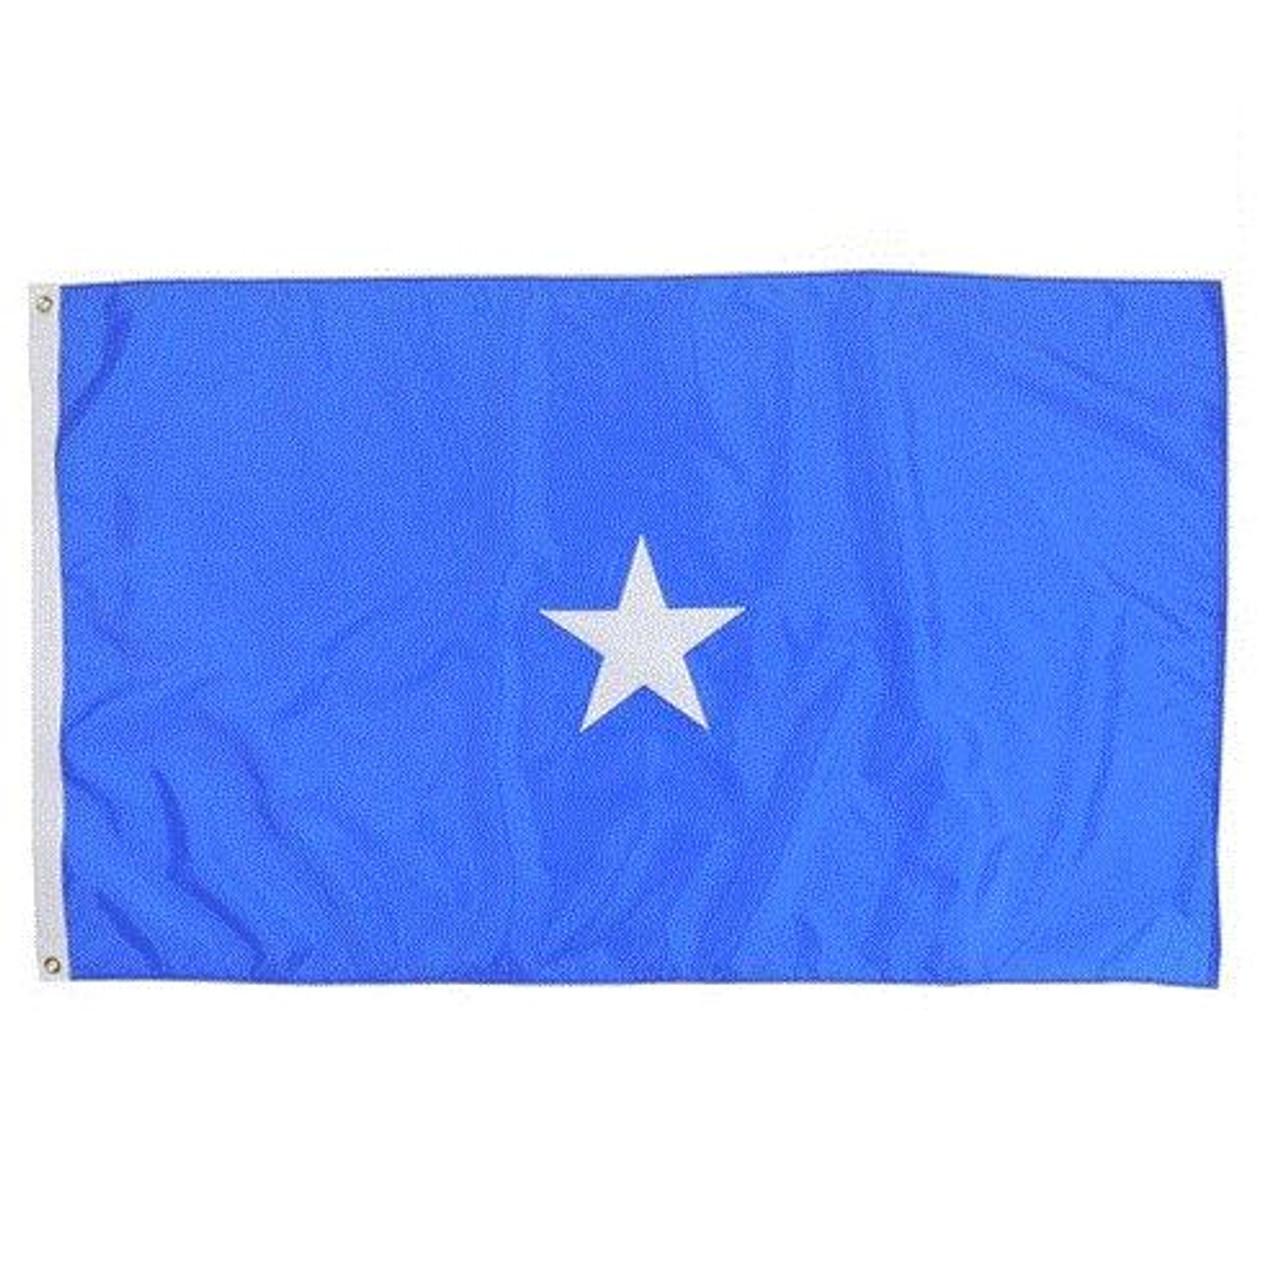 Air Force 1 Star Officer Flag